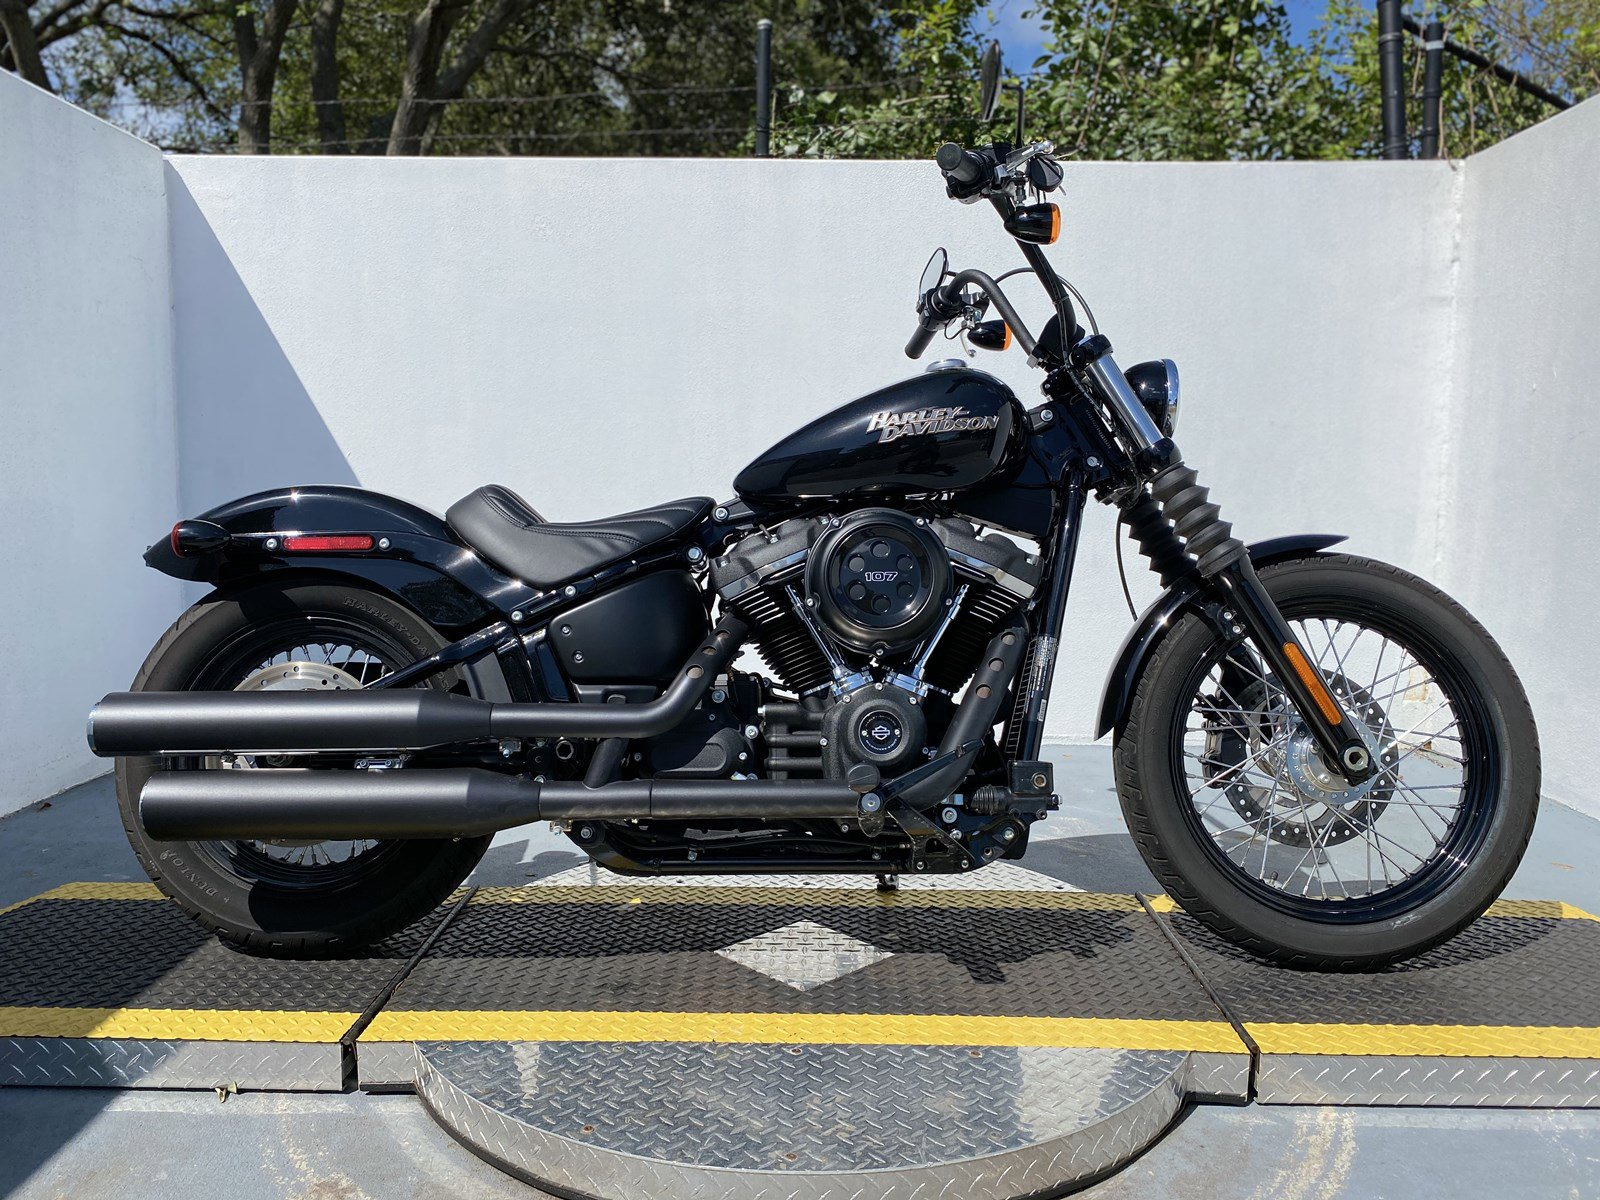 Pre-Owned 2019 Harley-Davidson Softail Street Bob FXBB